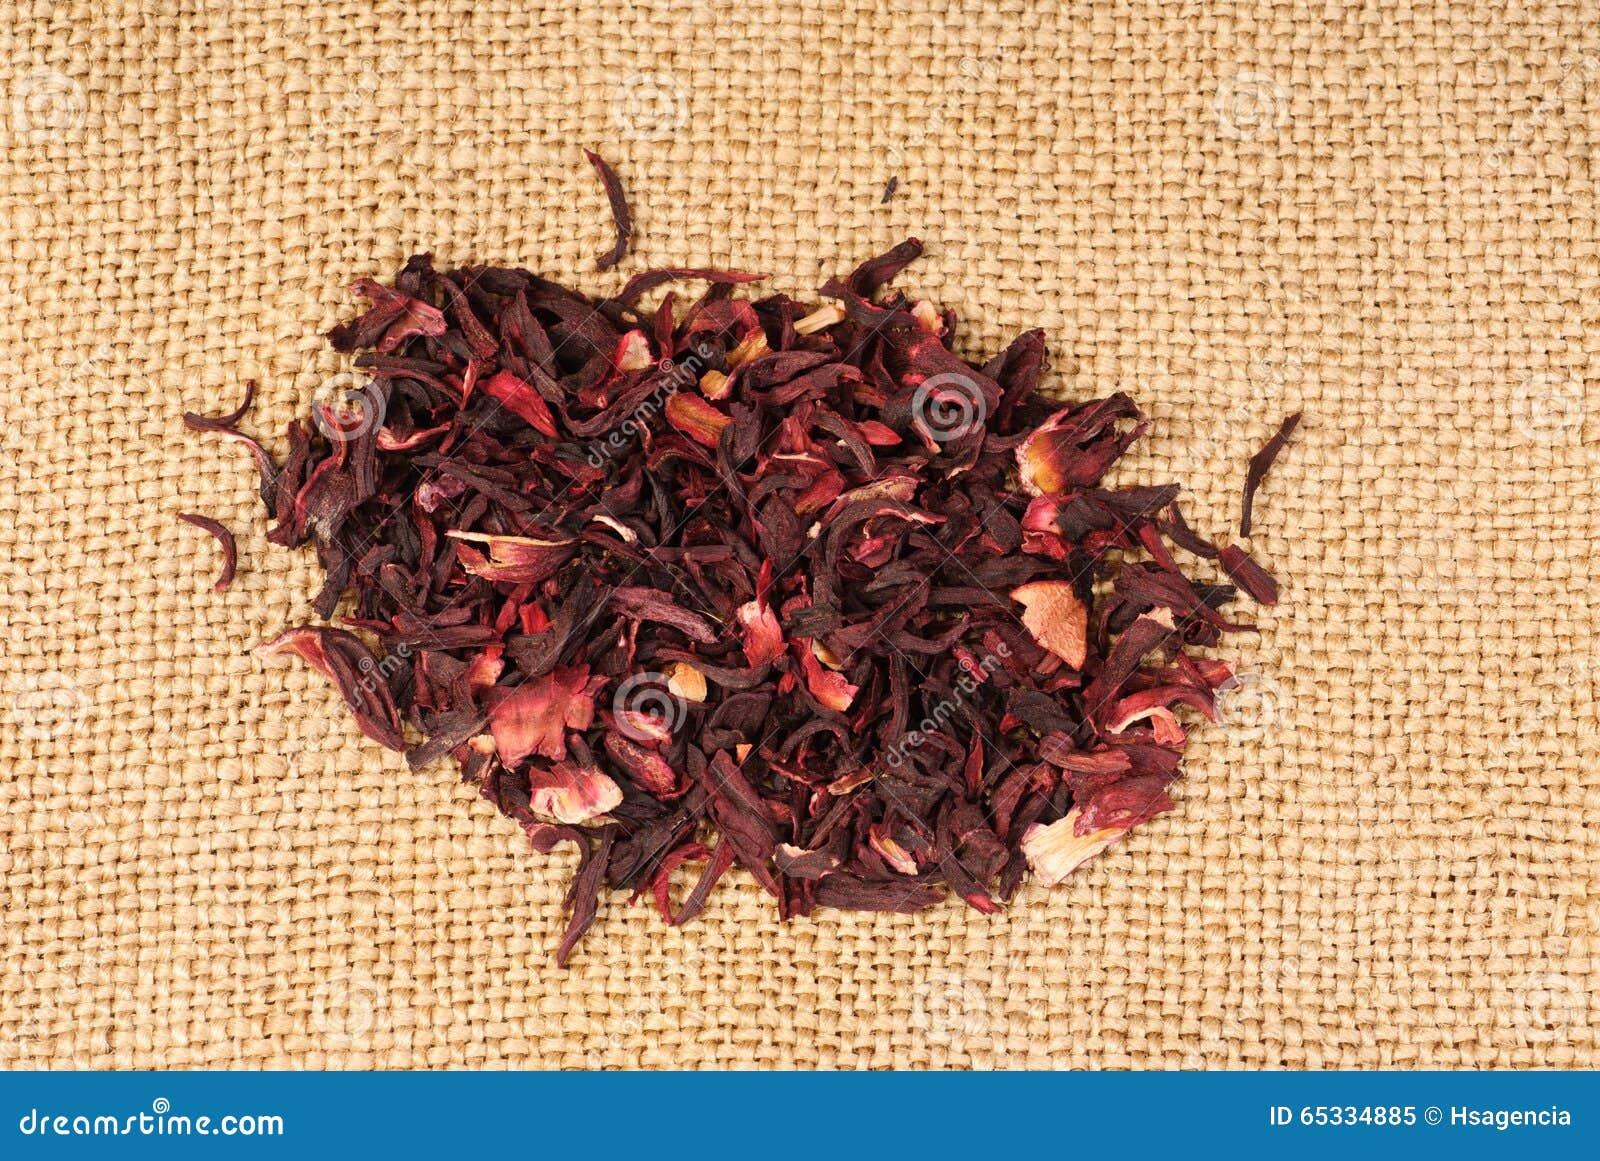 Hibiscus Tea Macro Dry Flower On Sackcloth Stock Image Image Of